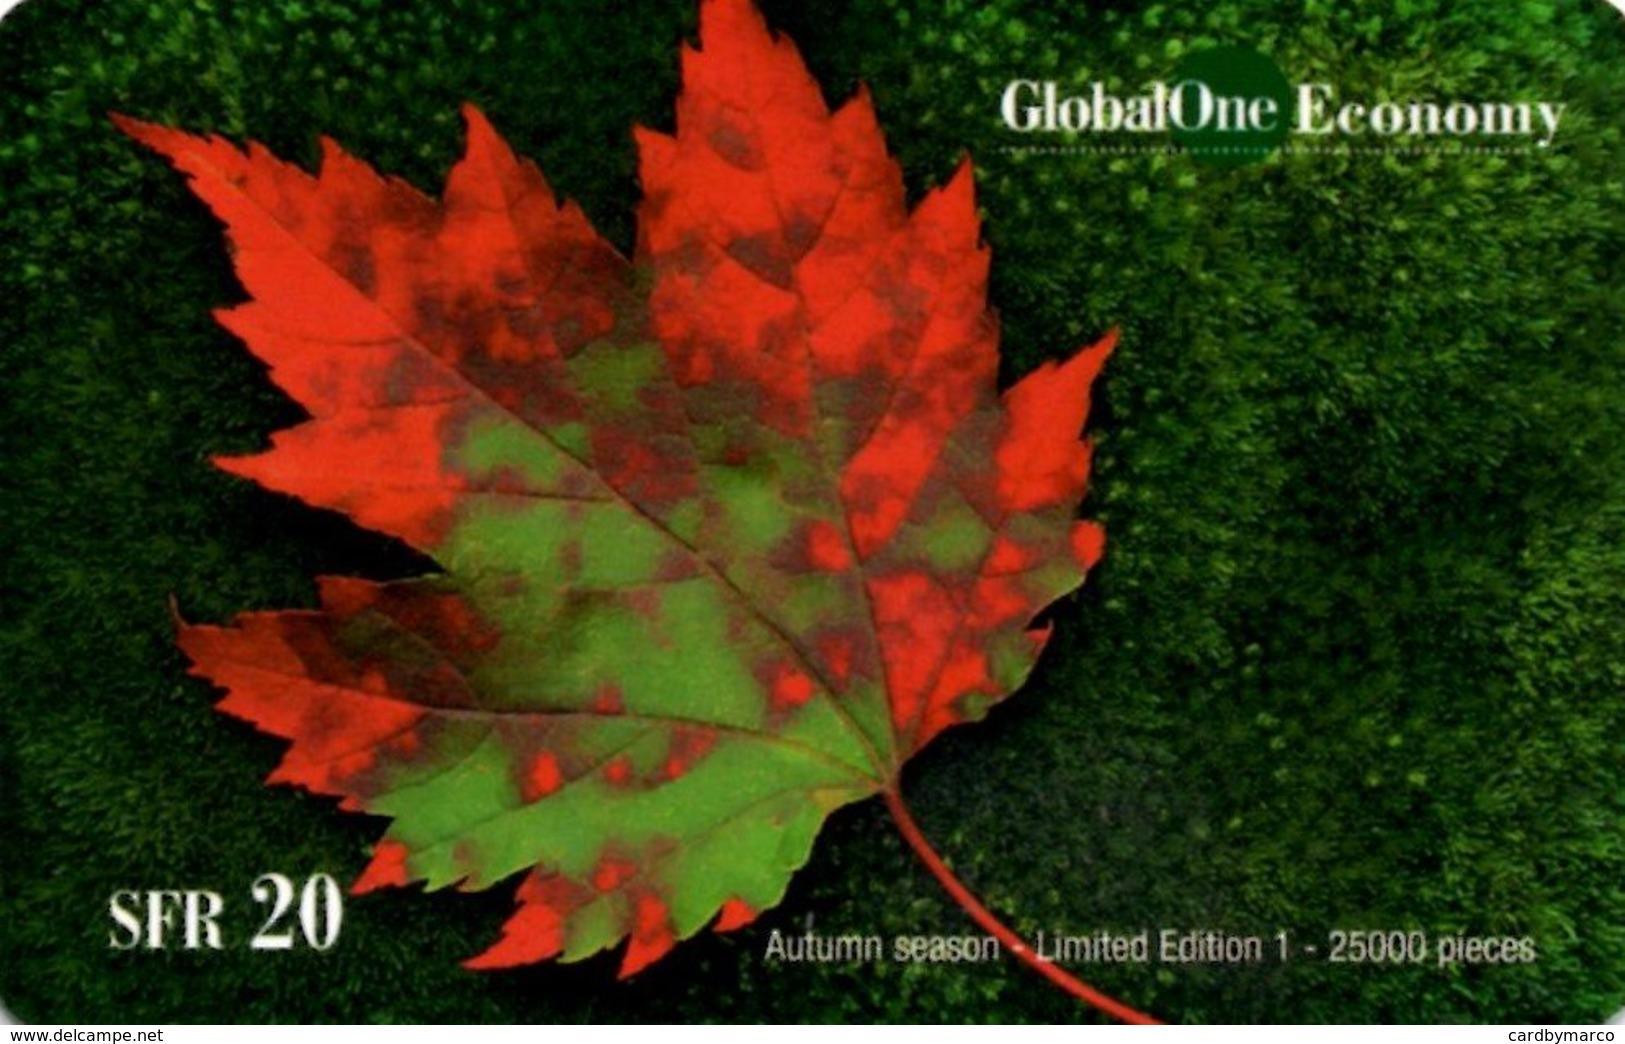 *SVIZZERA: GLOBAL ONE ECONOMY* - Scheda Usata - Svizzera